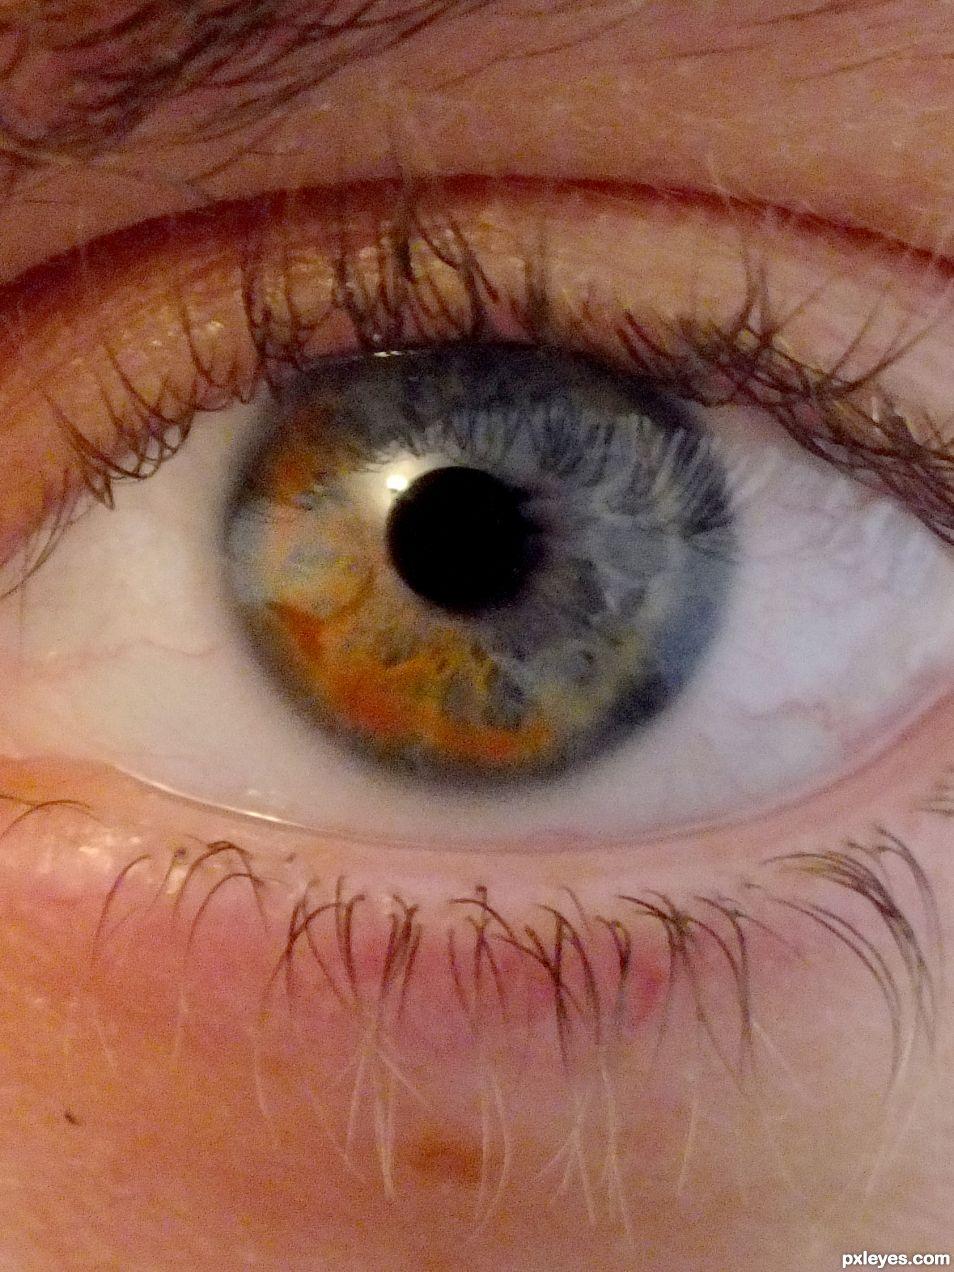 Heterochromia iridum picture, by Taff for: eyes ...  Heterochromia i...